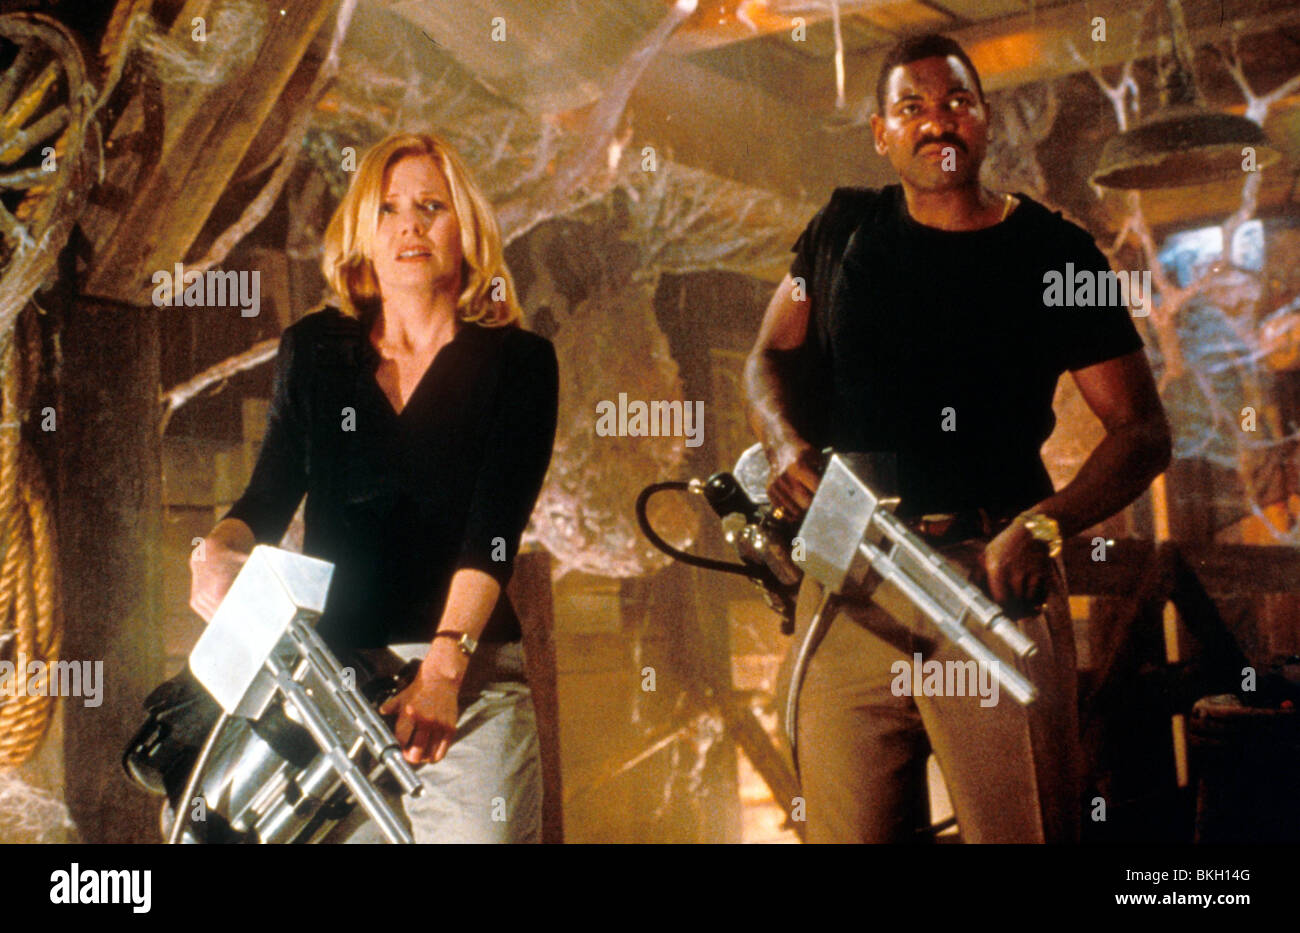 SPECIES II (1998) SPECIES 2 (ALT) MARG HELGENBERGER, MYKELTI WILLIAMSON SPE2 037 - Stock Image